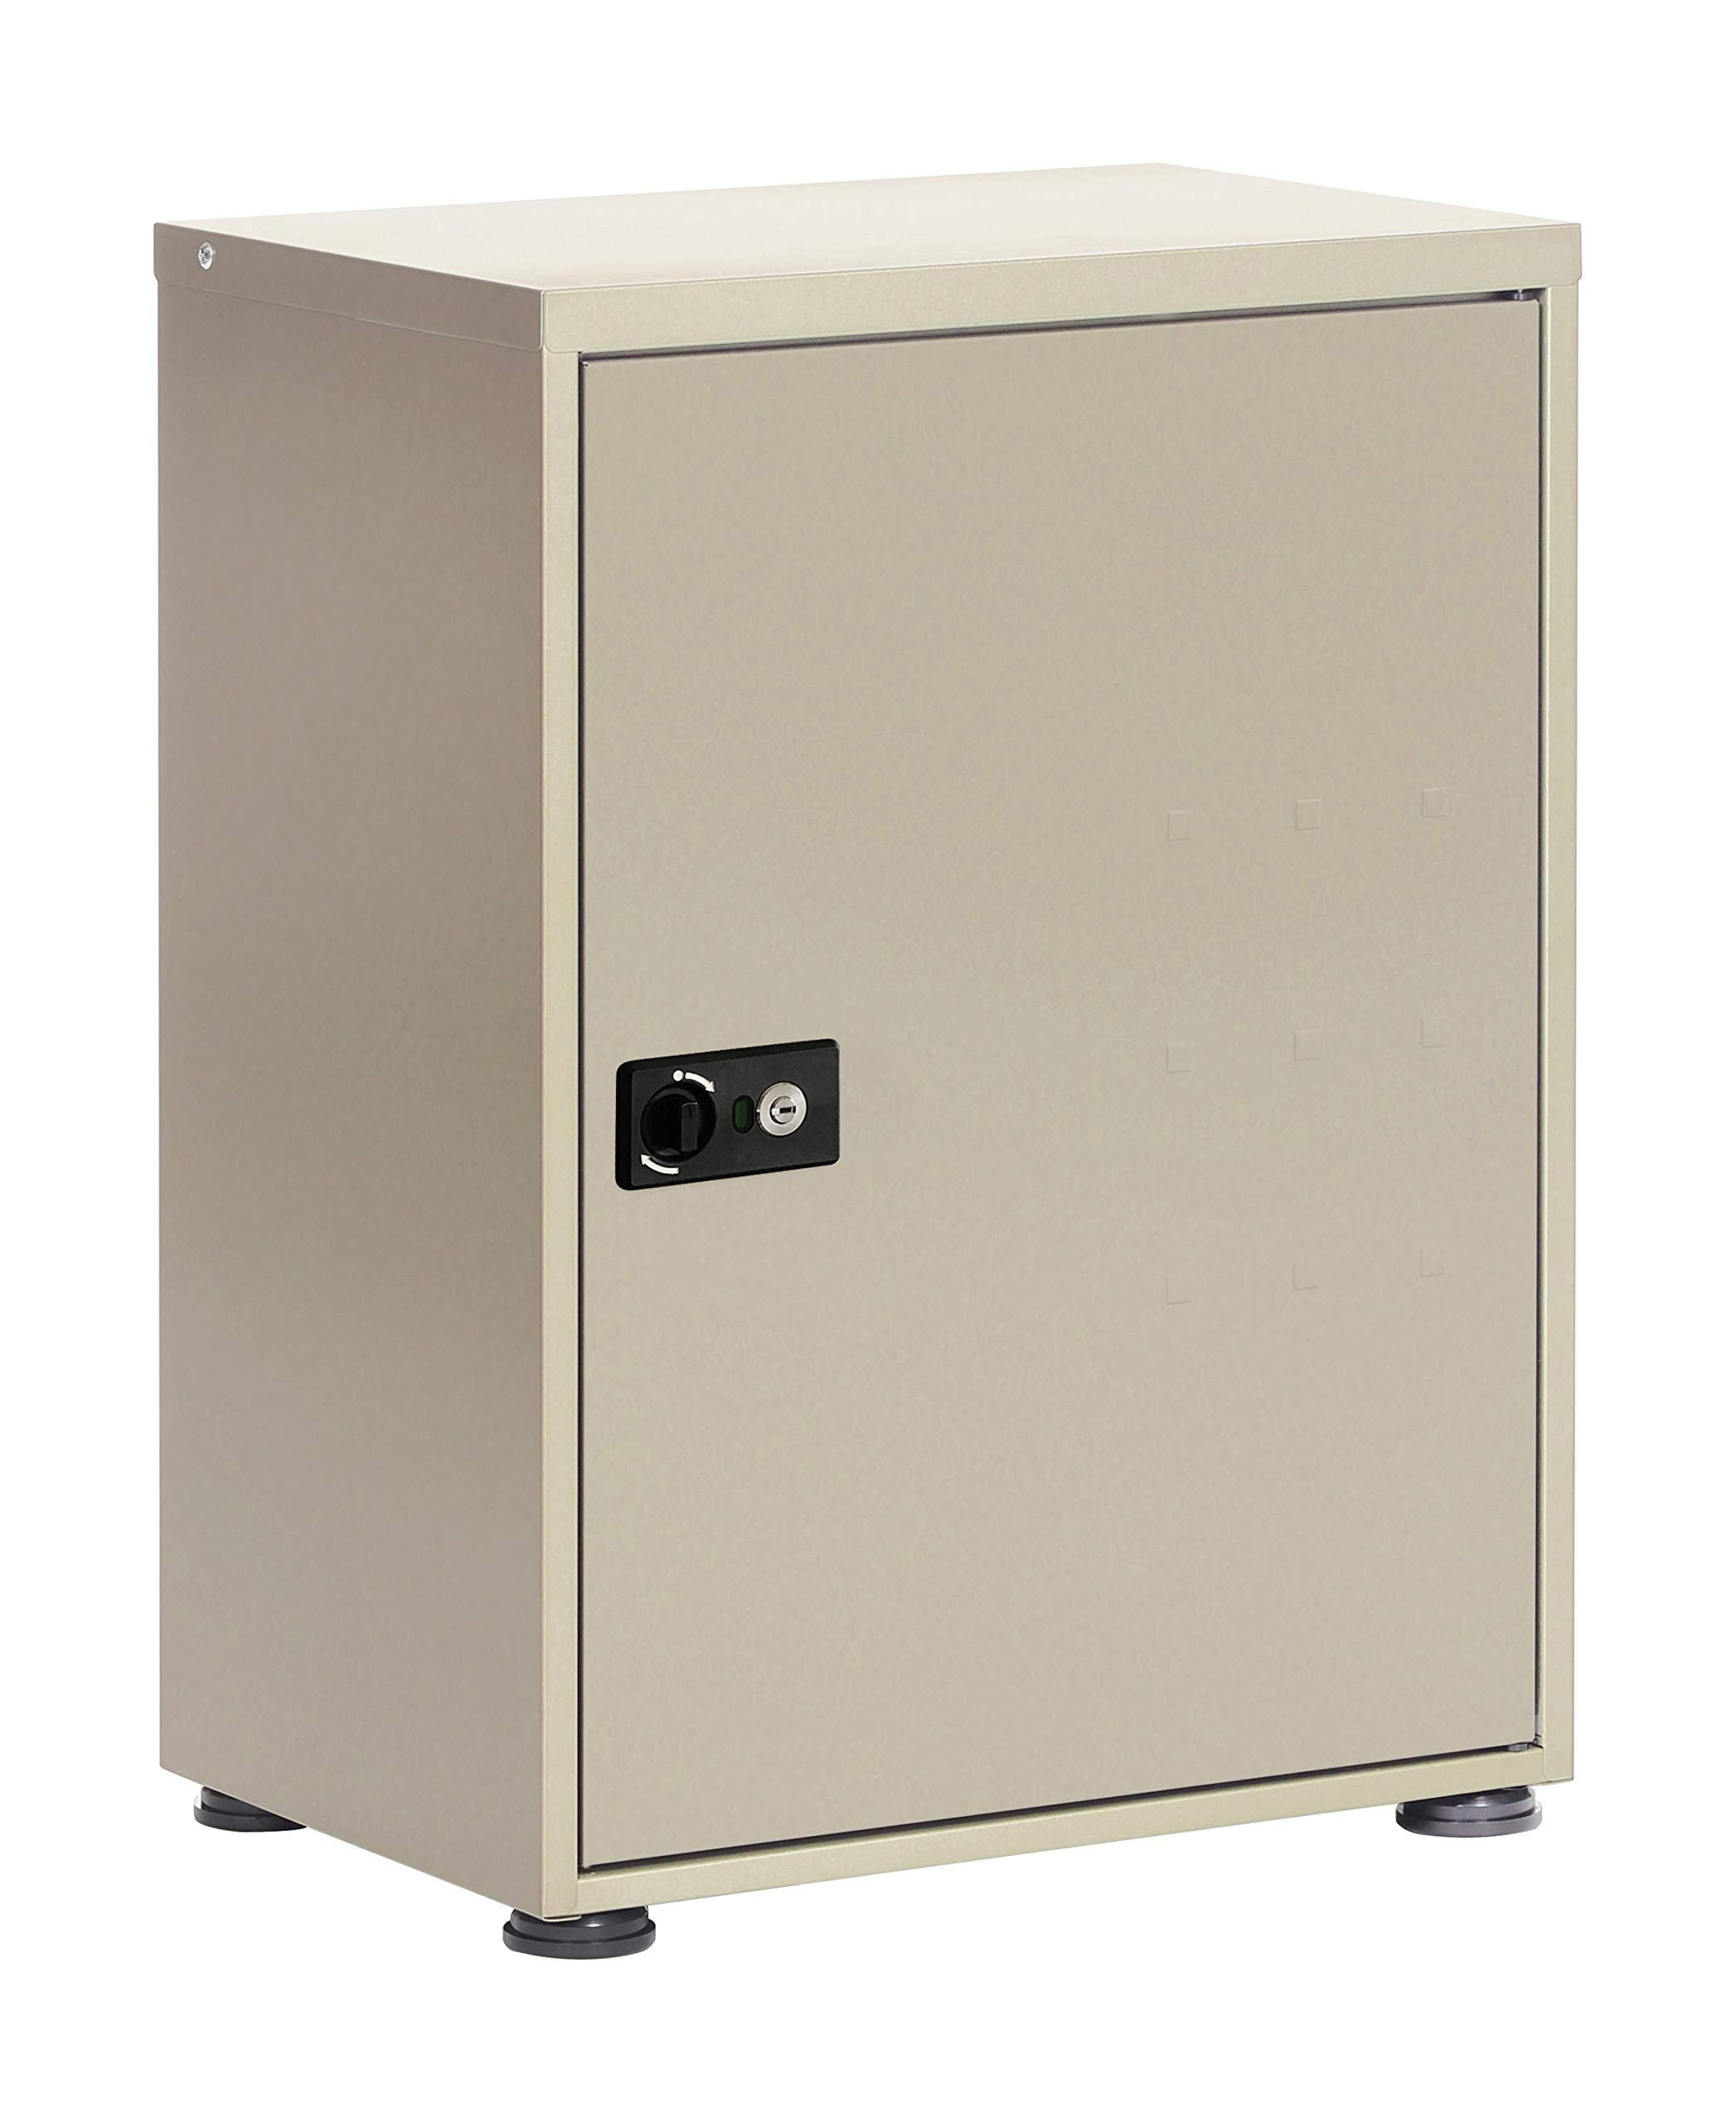 GREEN LIFE 快递箱 TR-3465J(TGY) 不在在不在时也能收到货物 倾斜 主体: 纵深35.5cm 本体: 高67cm 本体: 宽48cm